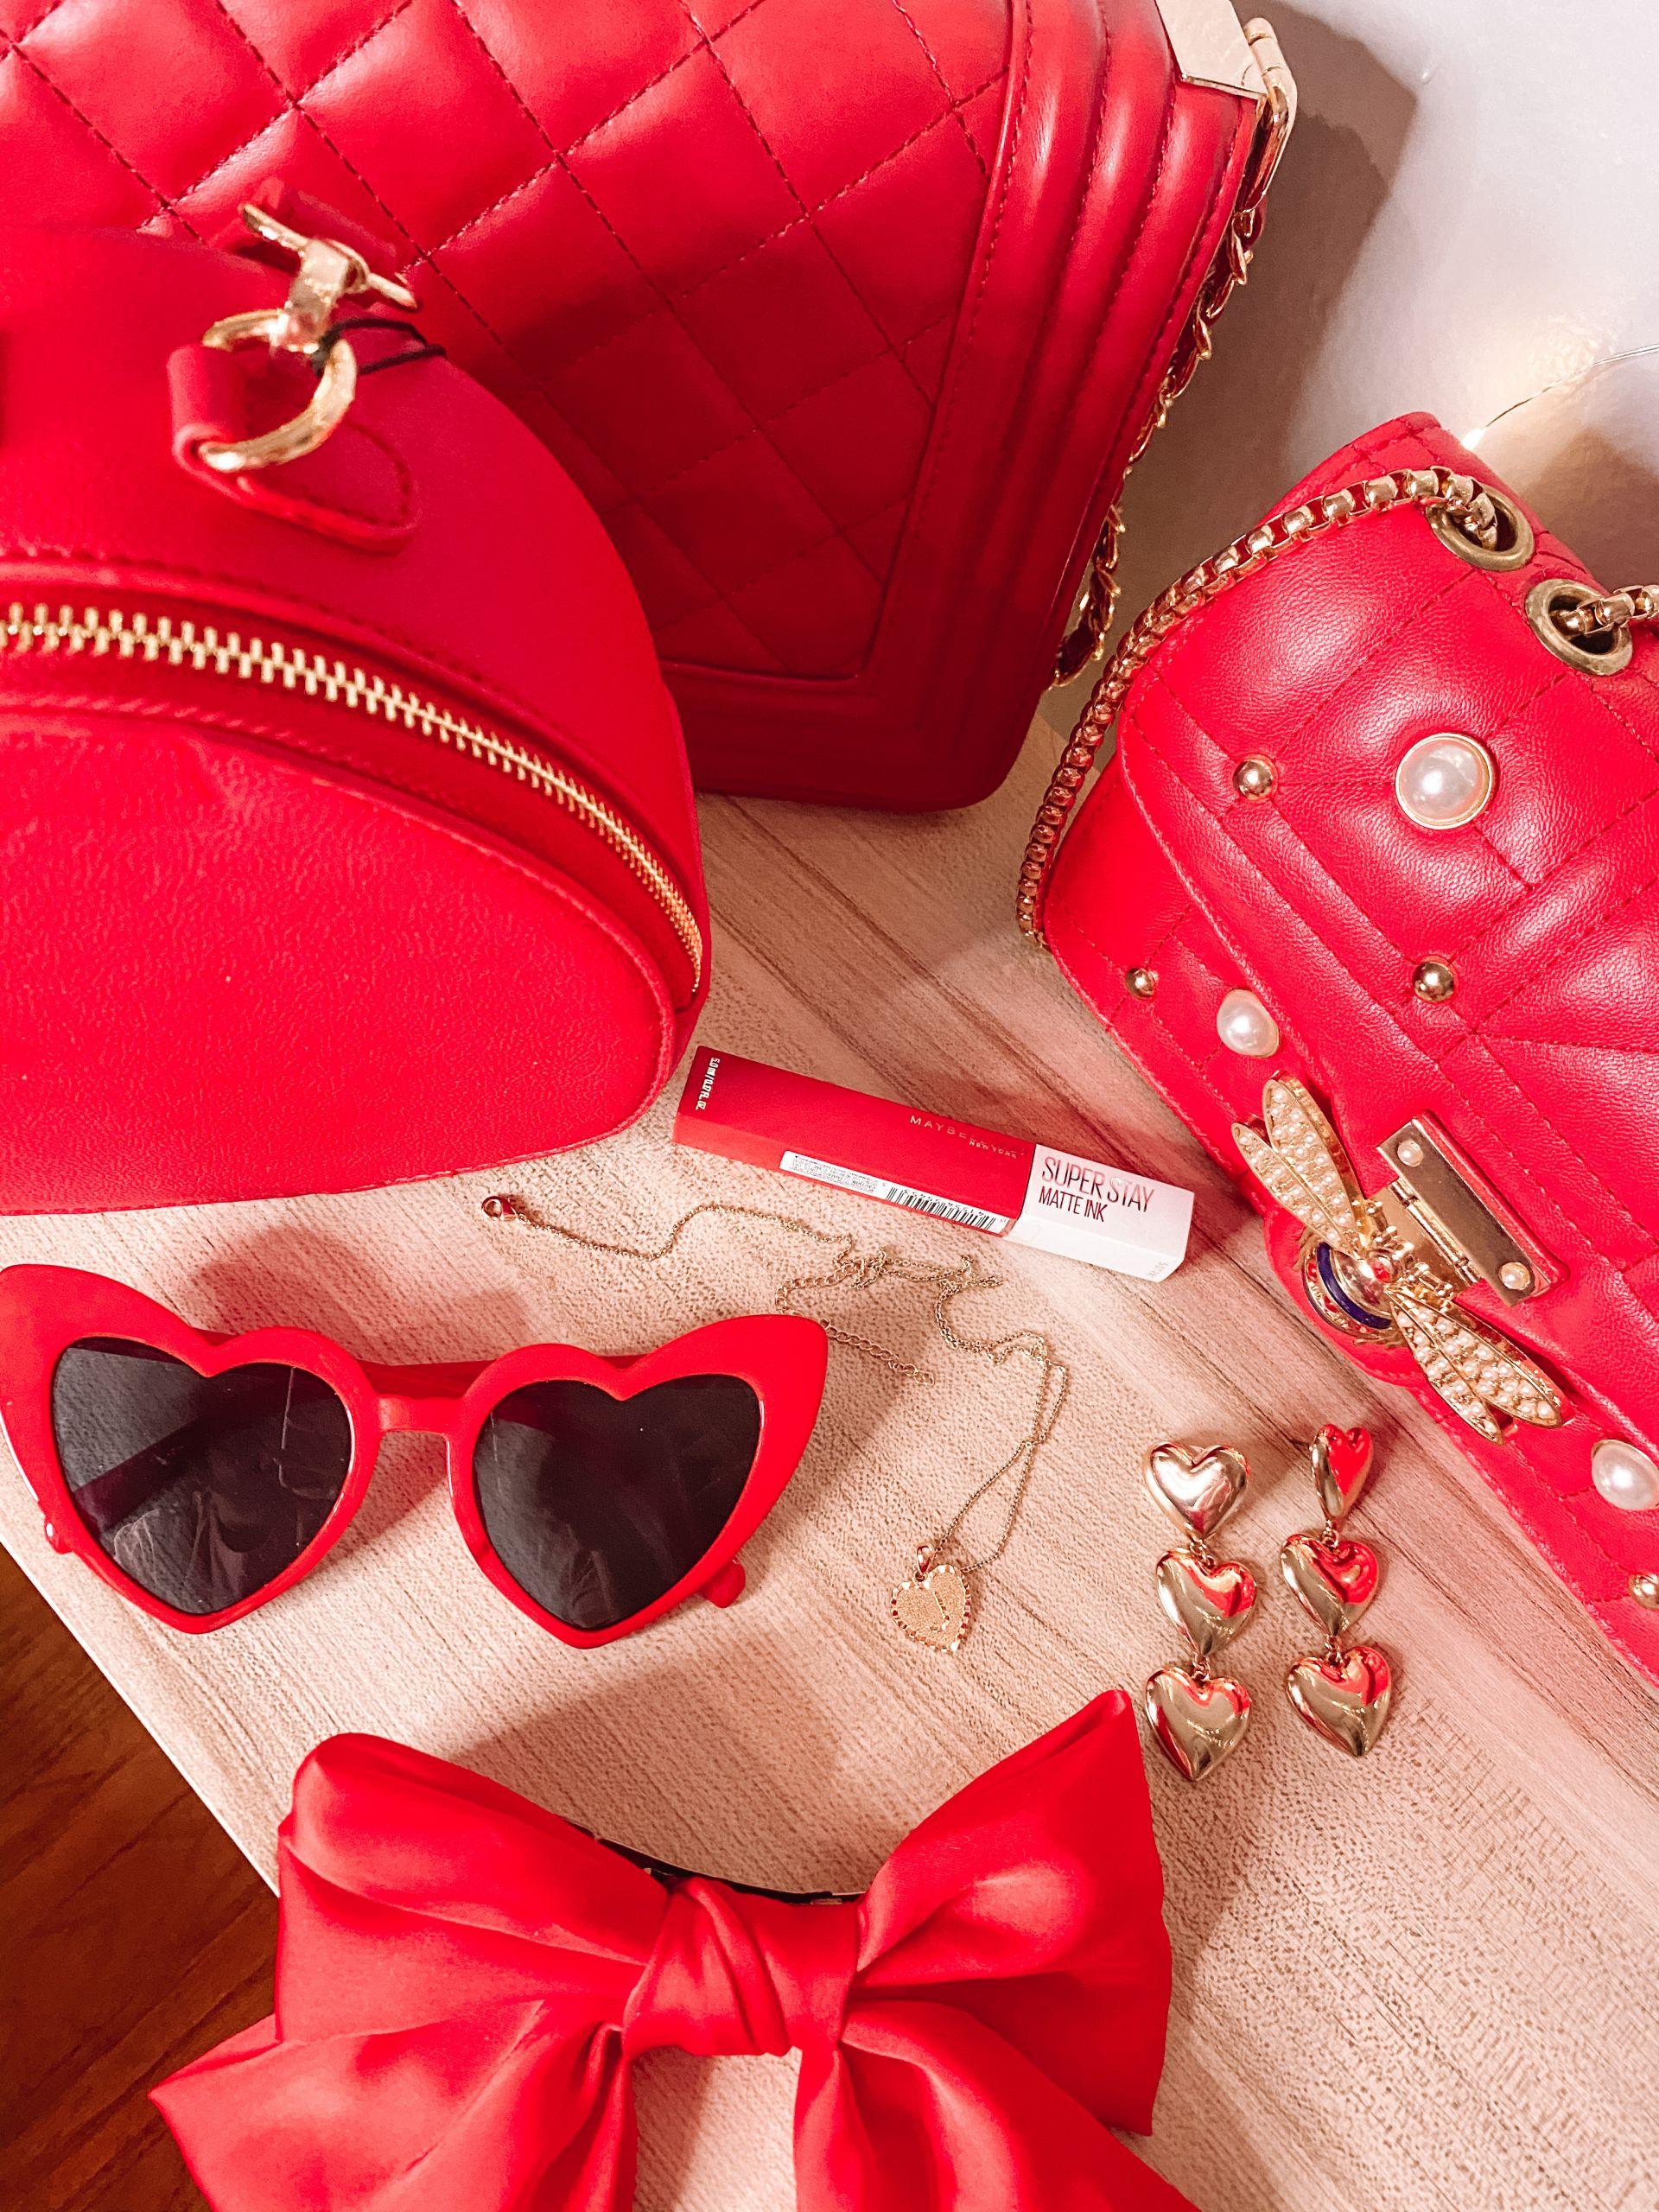 Red Valentine's Day Accessories I Love